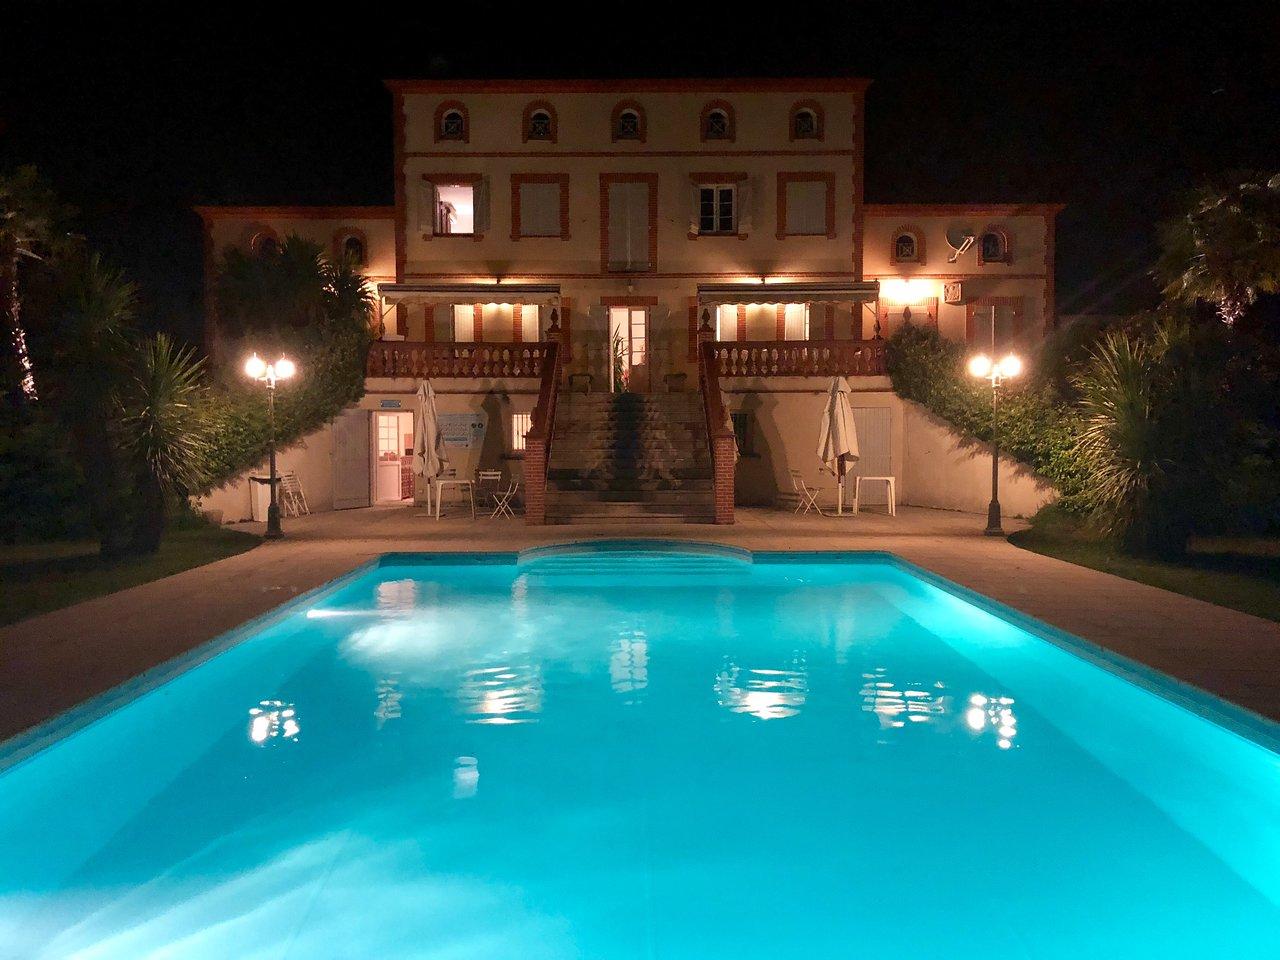 Domaine De Combe Ramond - Prices & Guest House Reviews ... tout Piscine Bombardiere